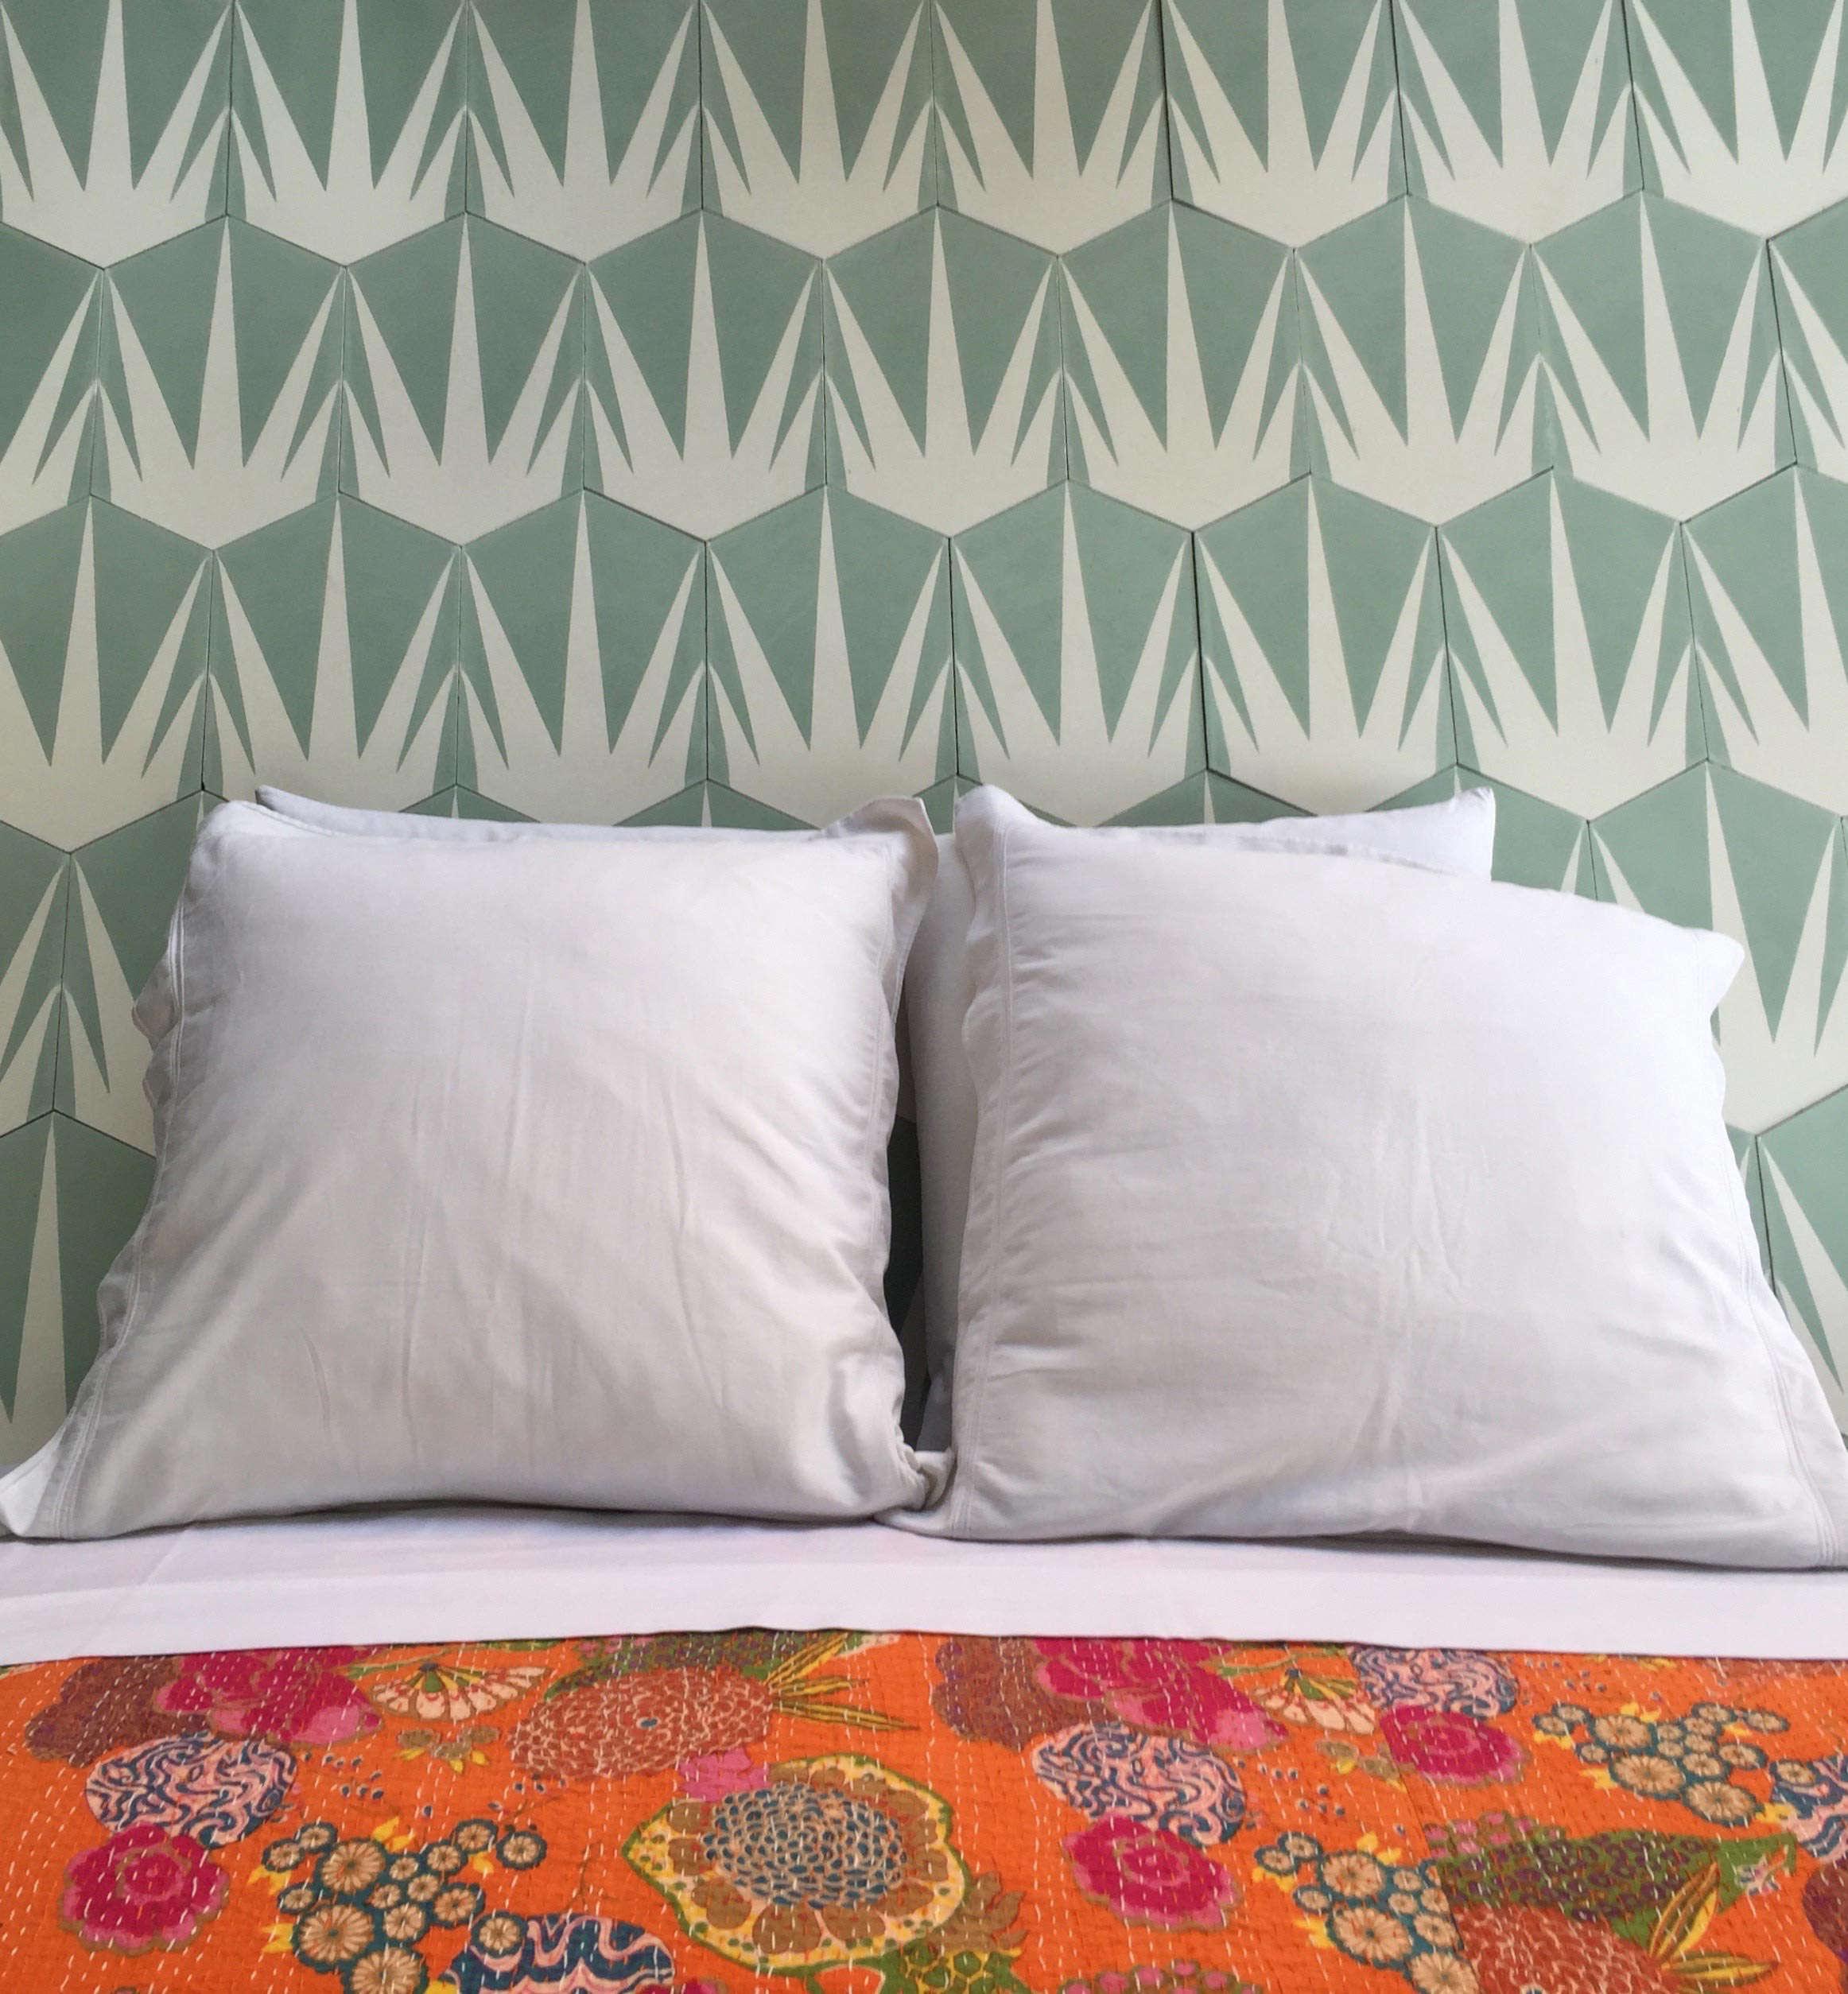 New Cement Tile Patterns from Popham Design in Marrakech Popham Tile Designs